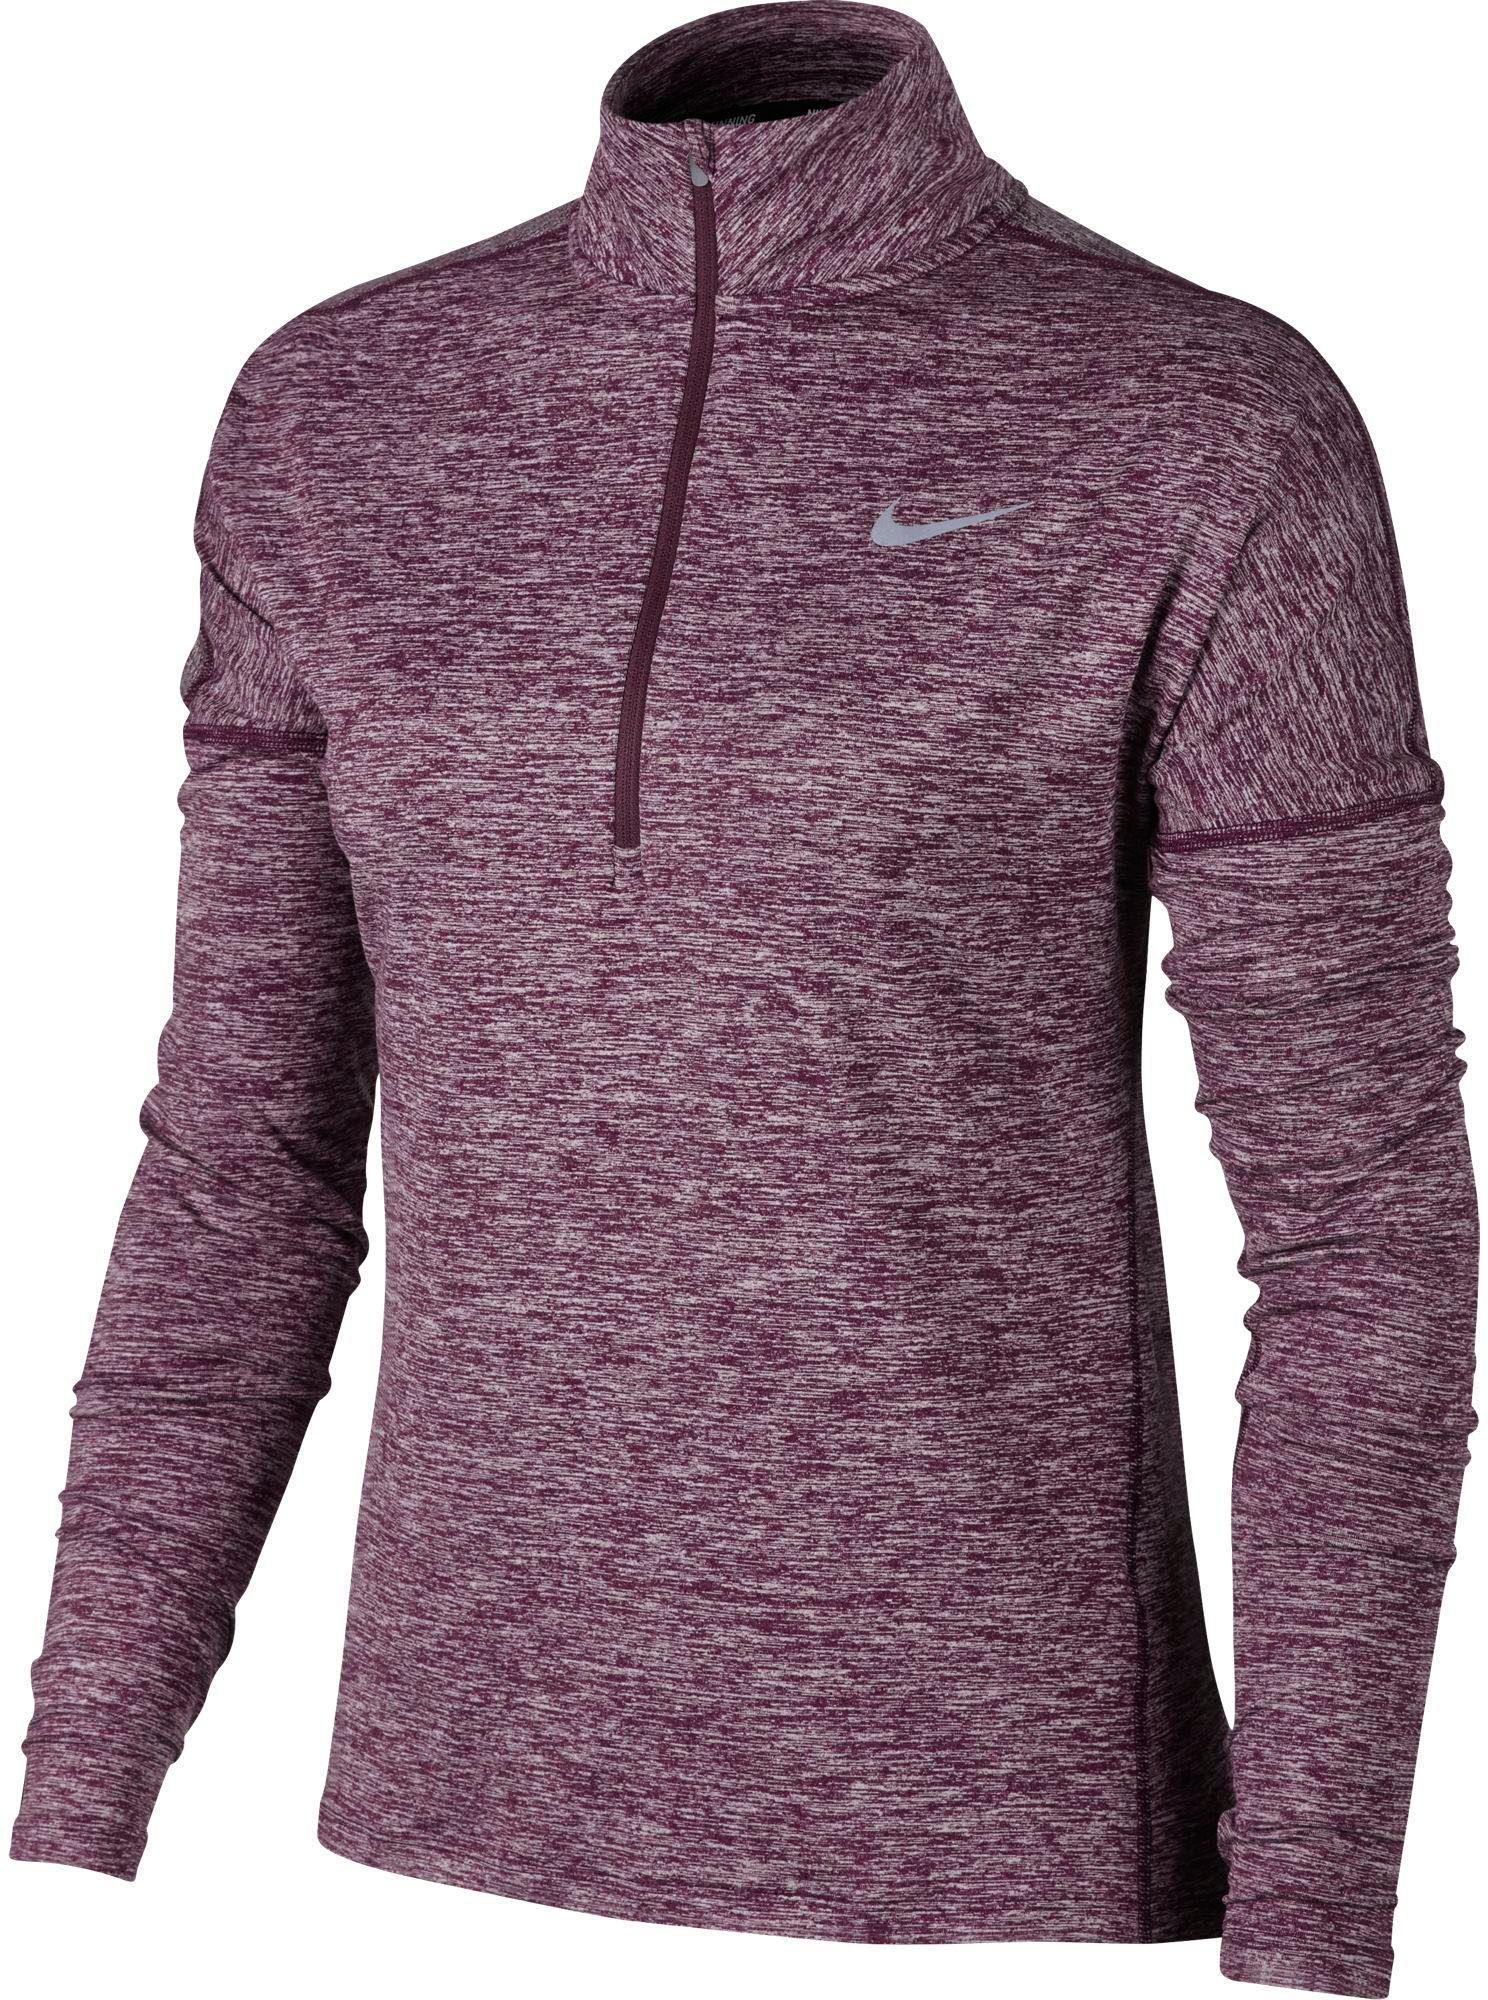 aaa02bf1 Nike Dry Element Half Zip Long Sleeve Running Shirt in Purple - Lyst